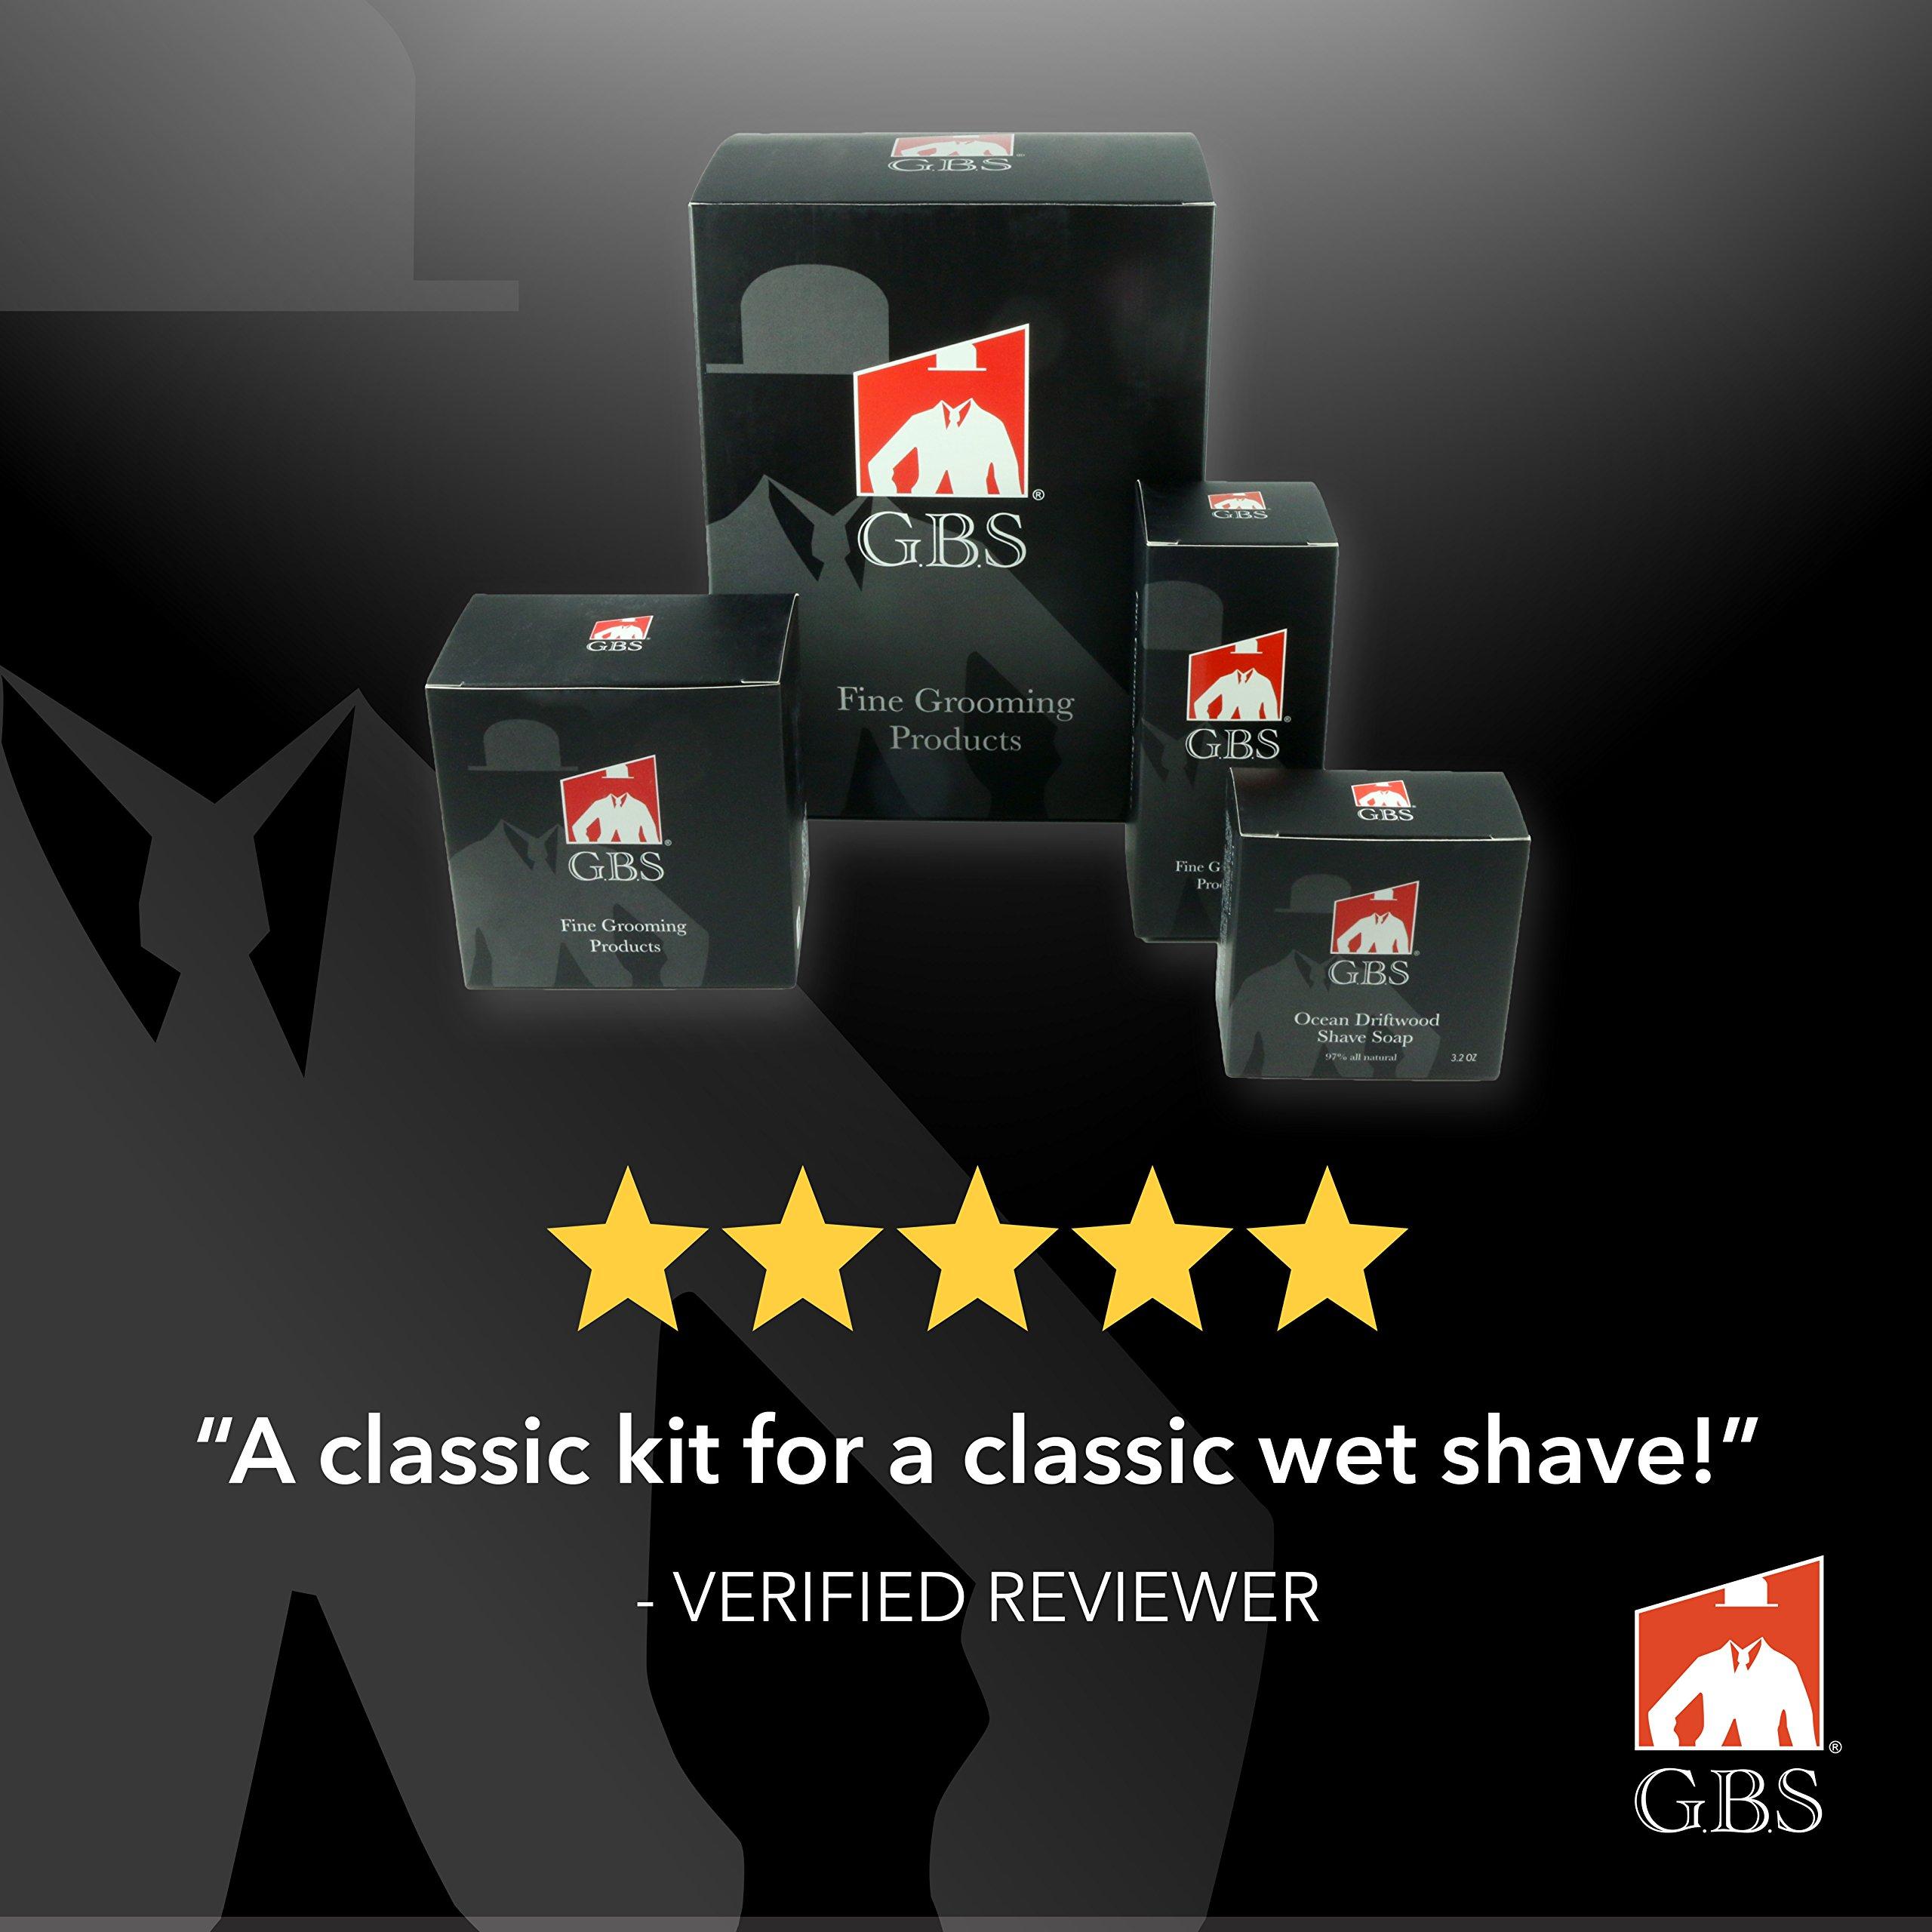 GBS Men Luxury Straight Razor Shaving Set 9 Pcs: 5/8'' Black Carbon Cut Throat Razor + Case, Leather Razor Strop, Pure Badger Brush, Wooden Bowl + Soap, Brush & Razor Stand, Honing Paste, Alum Block by GBS